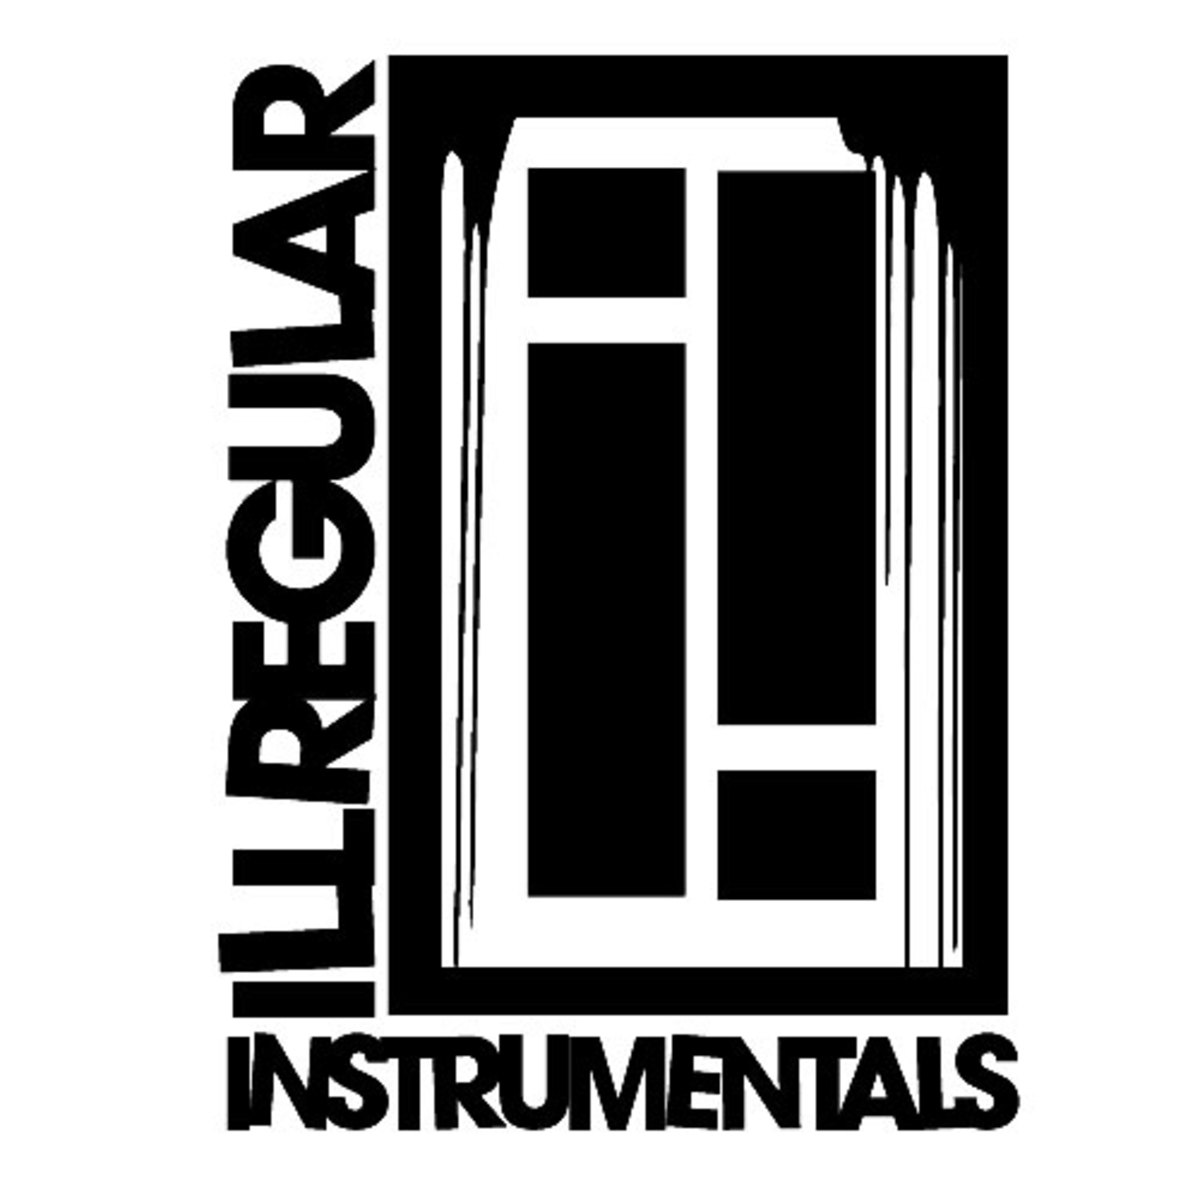 illregularinstrumentals.jpg